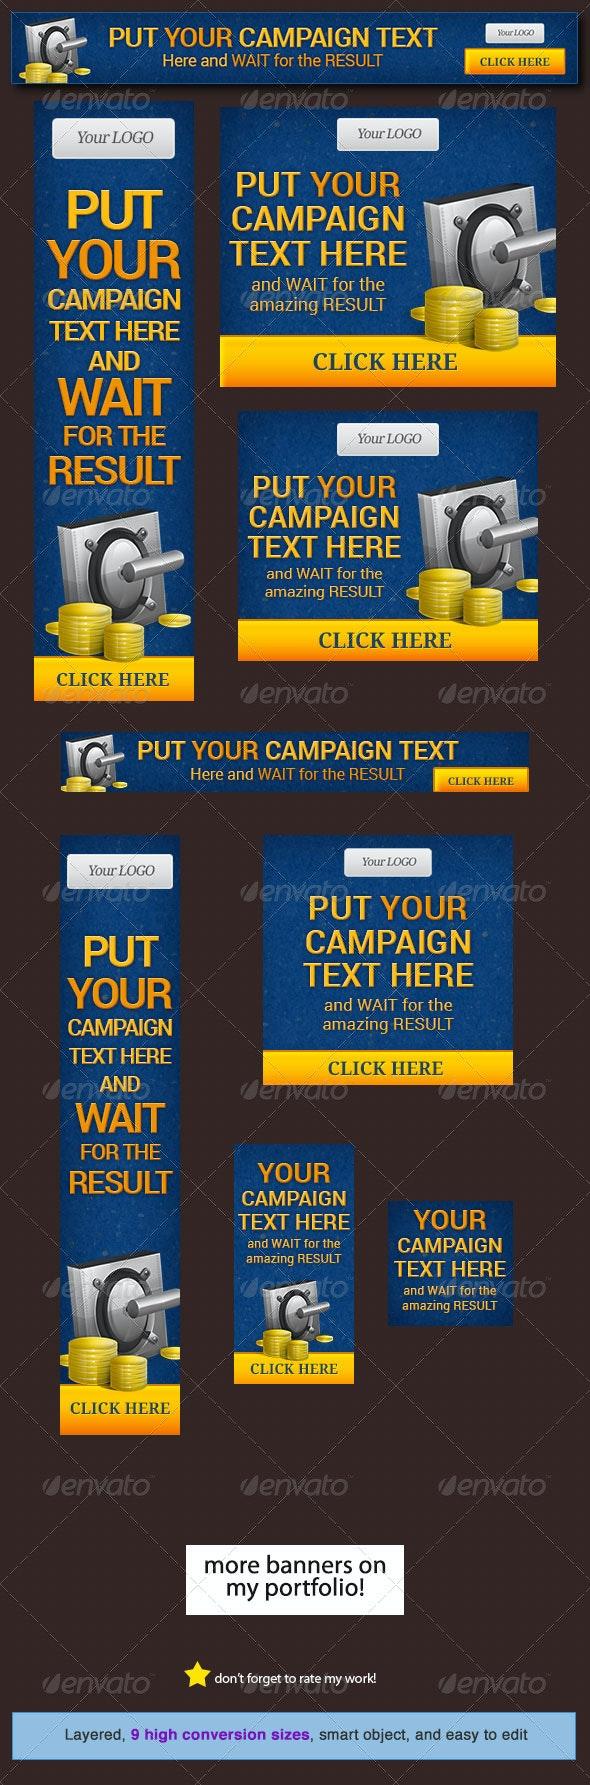 Money Maker Web Banner Design Template - Banners & Ads Web Elements